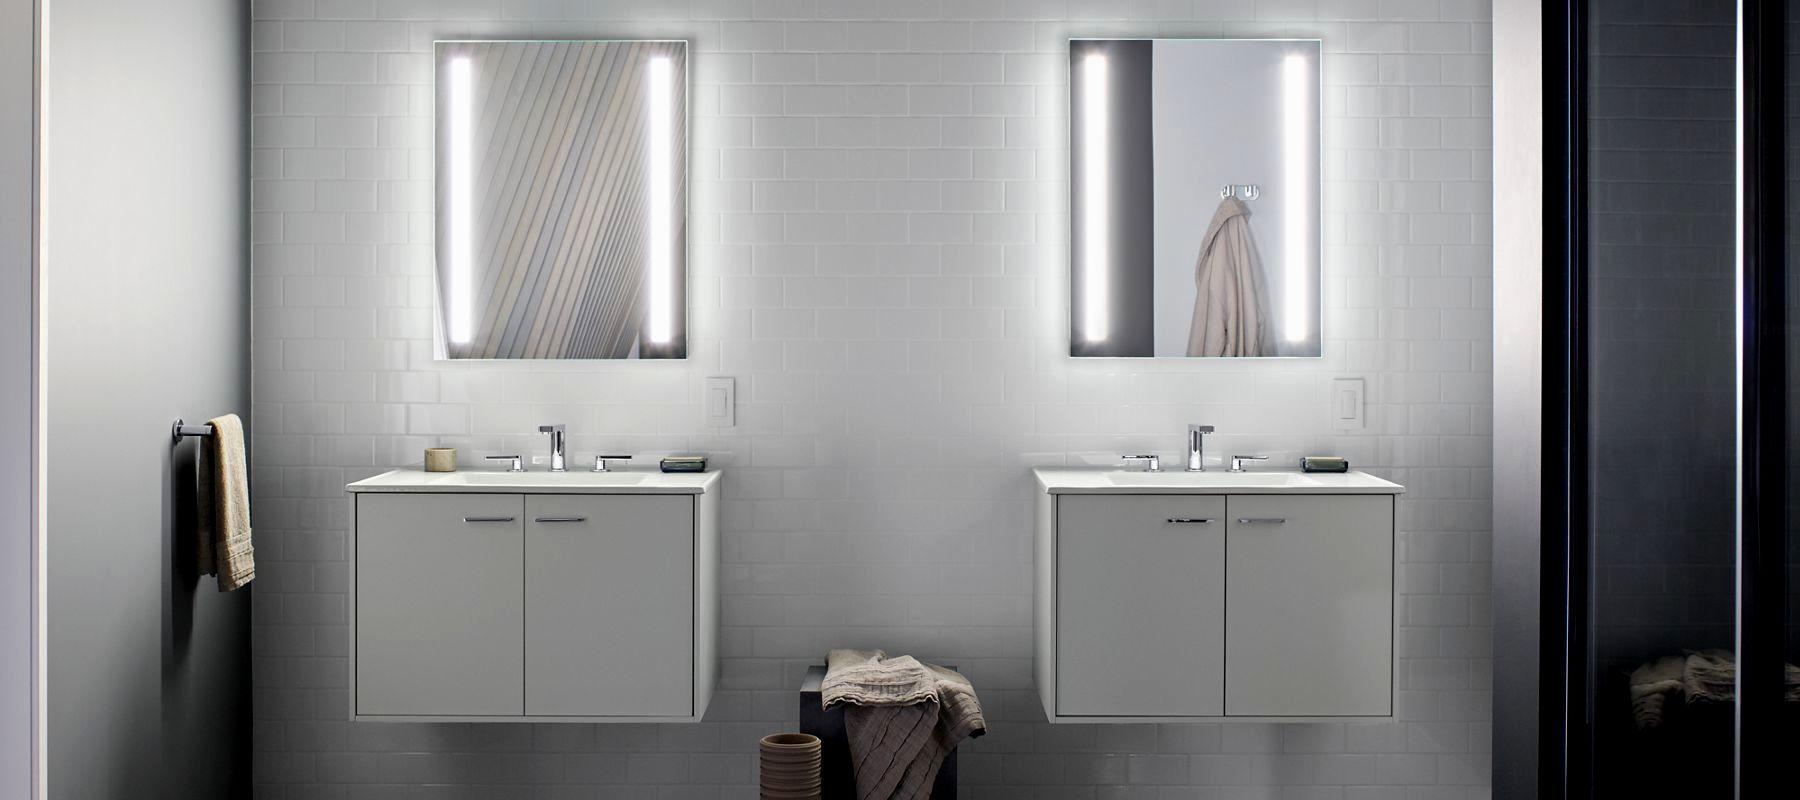 sensational bathroom storage cabinets gallery-Fancy Bathroom Storage Cabinets Portrait